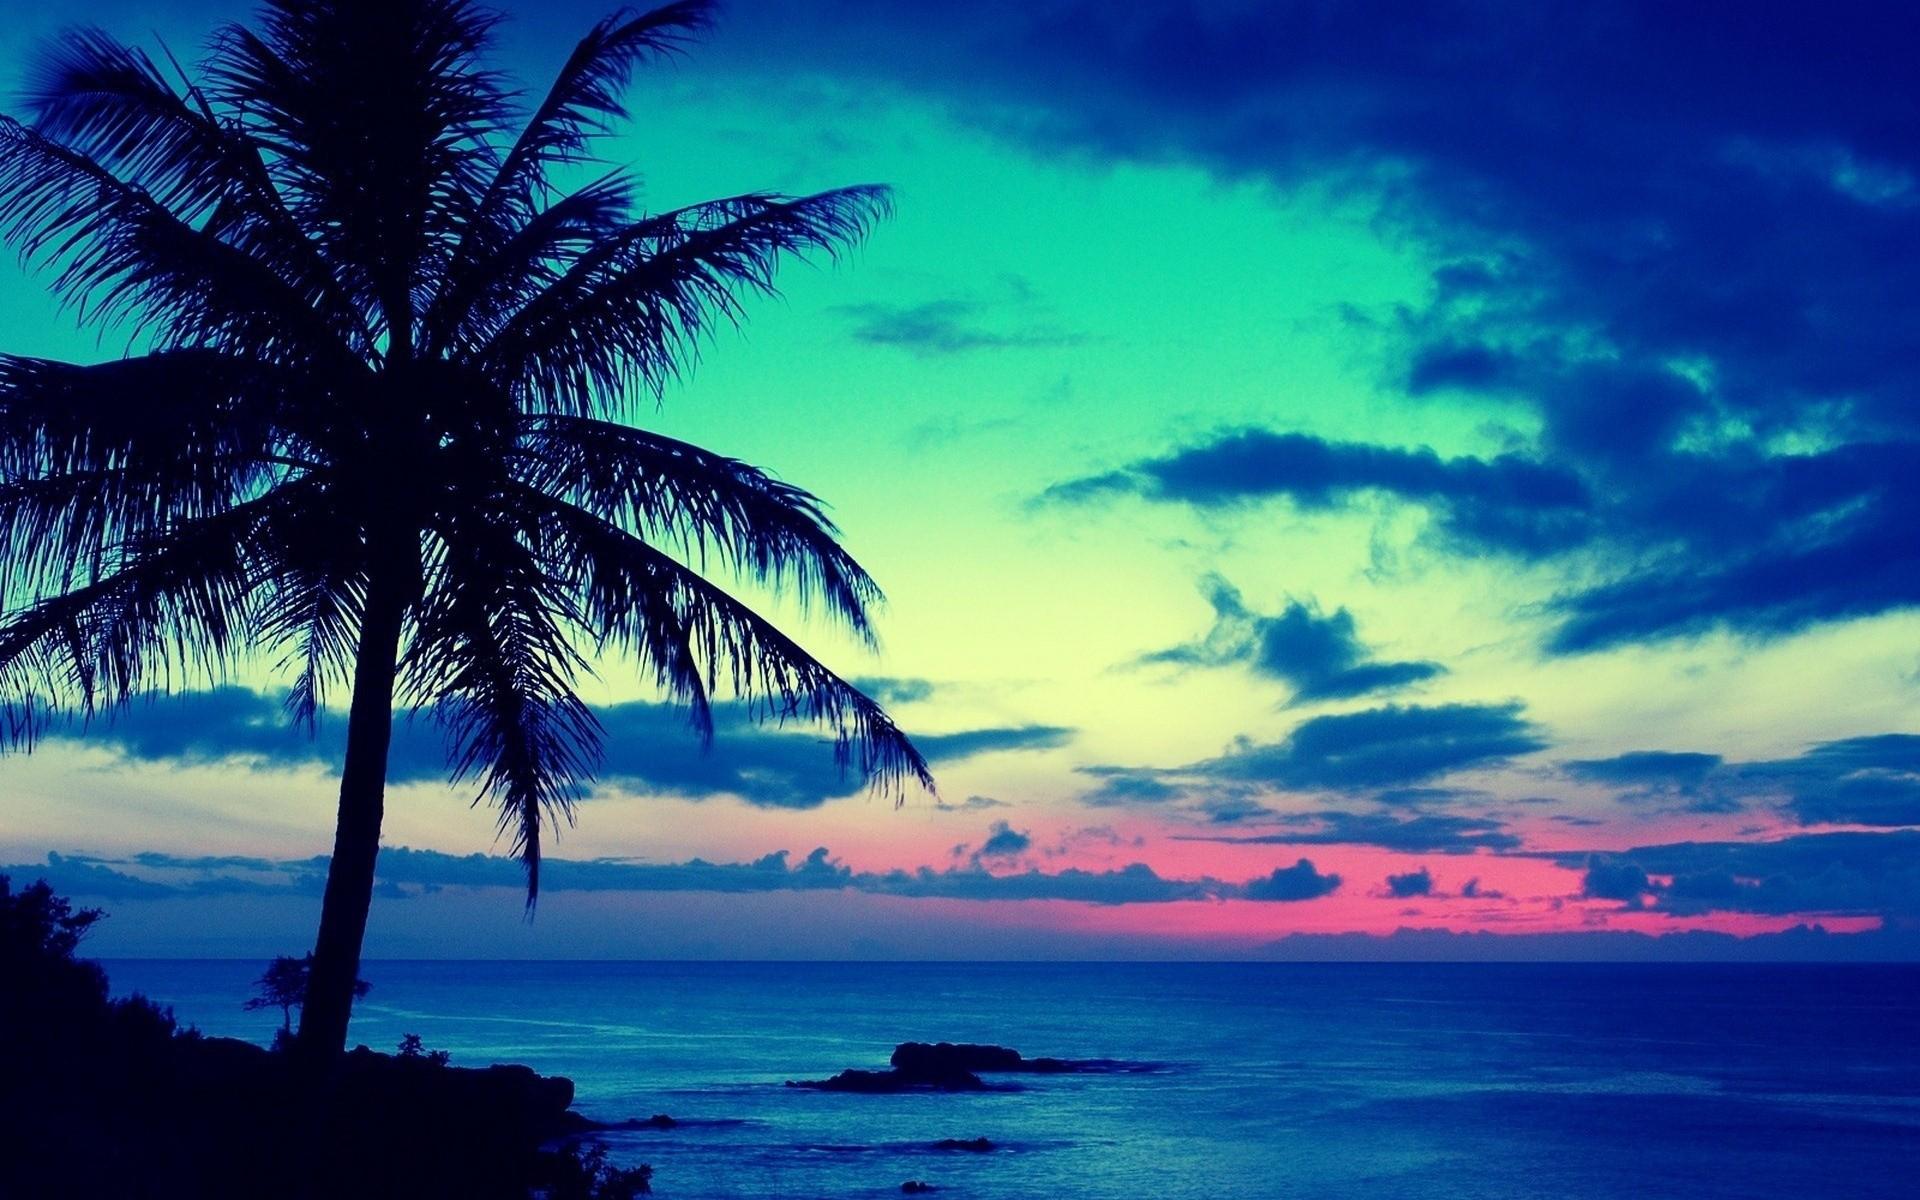 Atardeceres en playas - 1920x1200